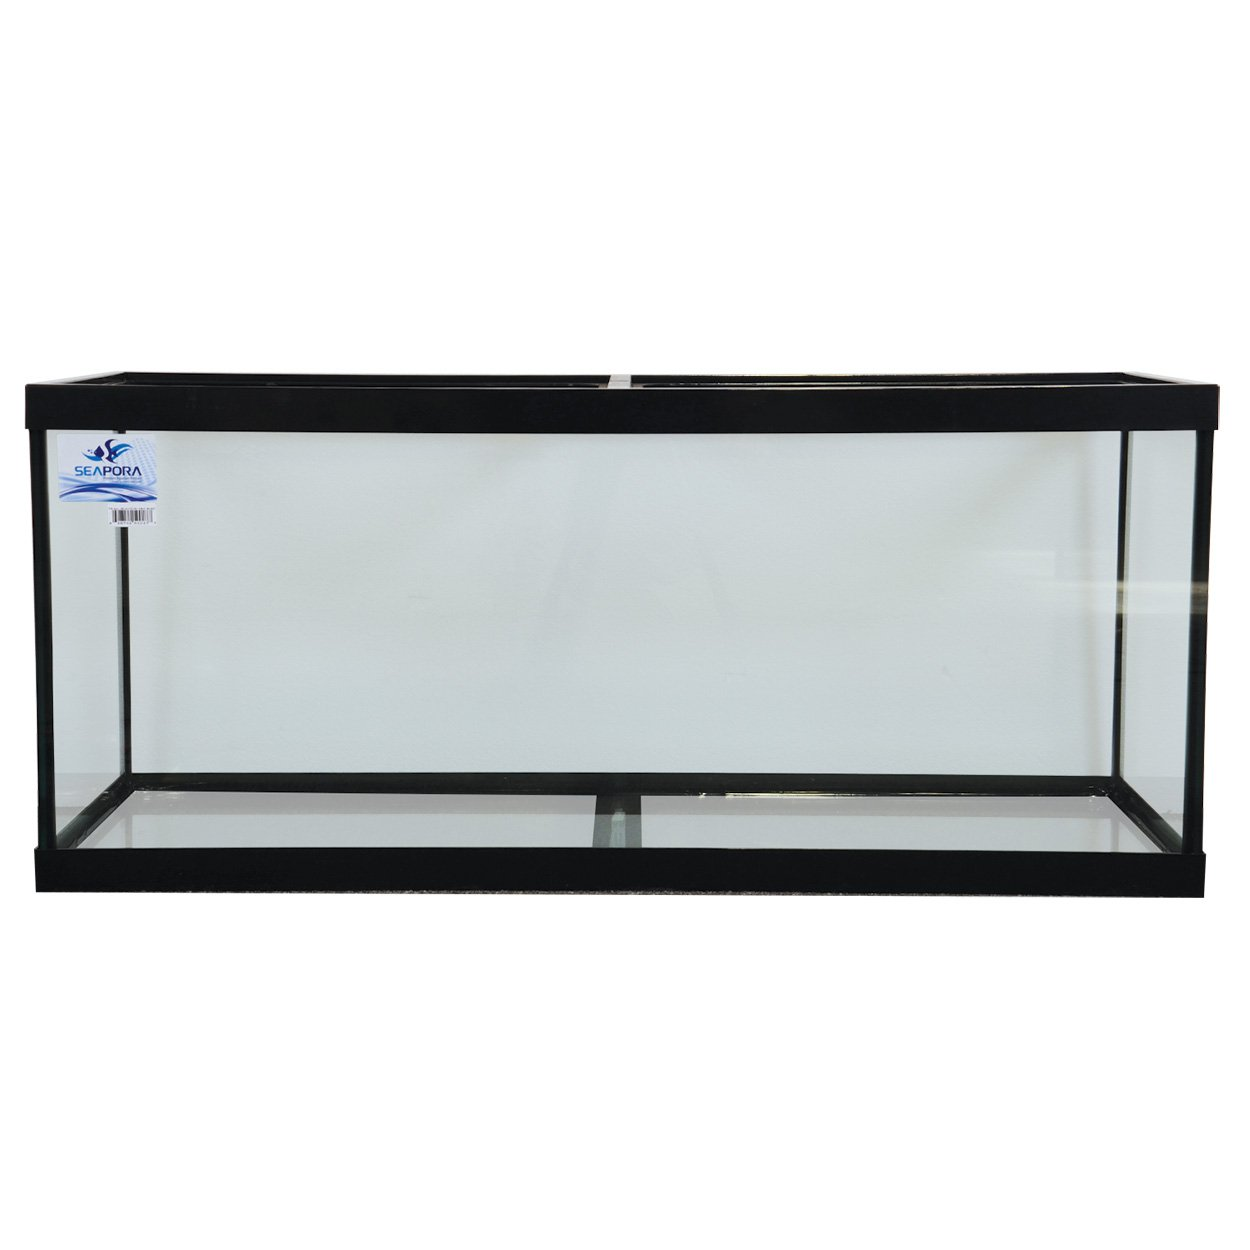 Seapora 59214 Standard Aquarium, 75 Gallon by Seapora